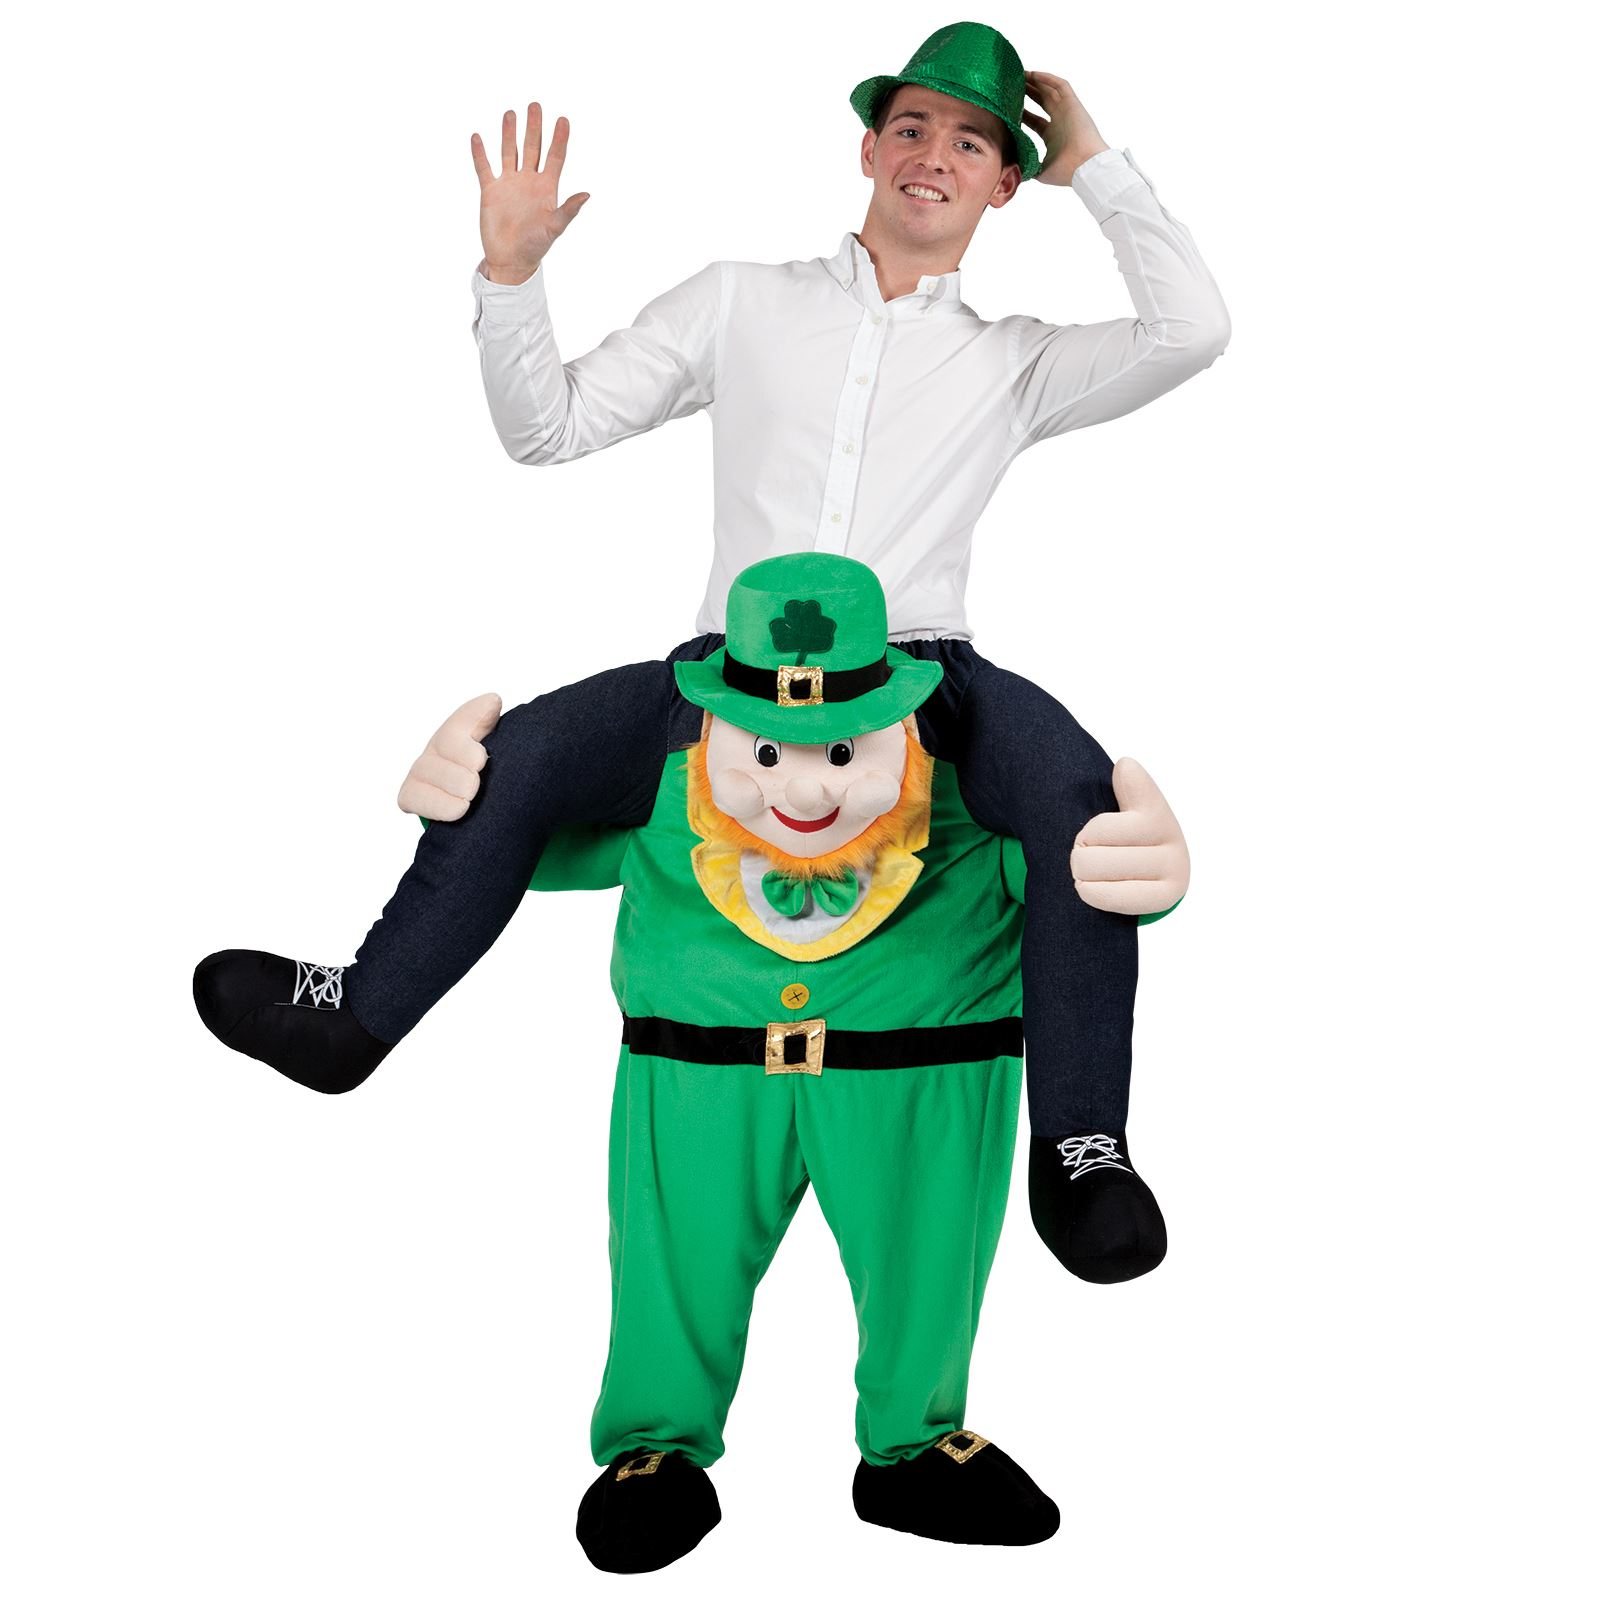 Child Funny Carry Me Leprechaun St Patricks Day Irish Fancy Dress Mascot Costume